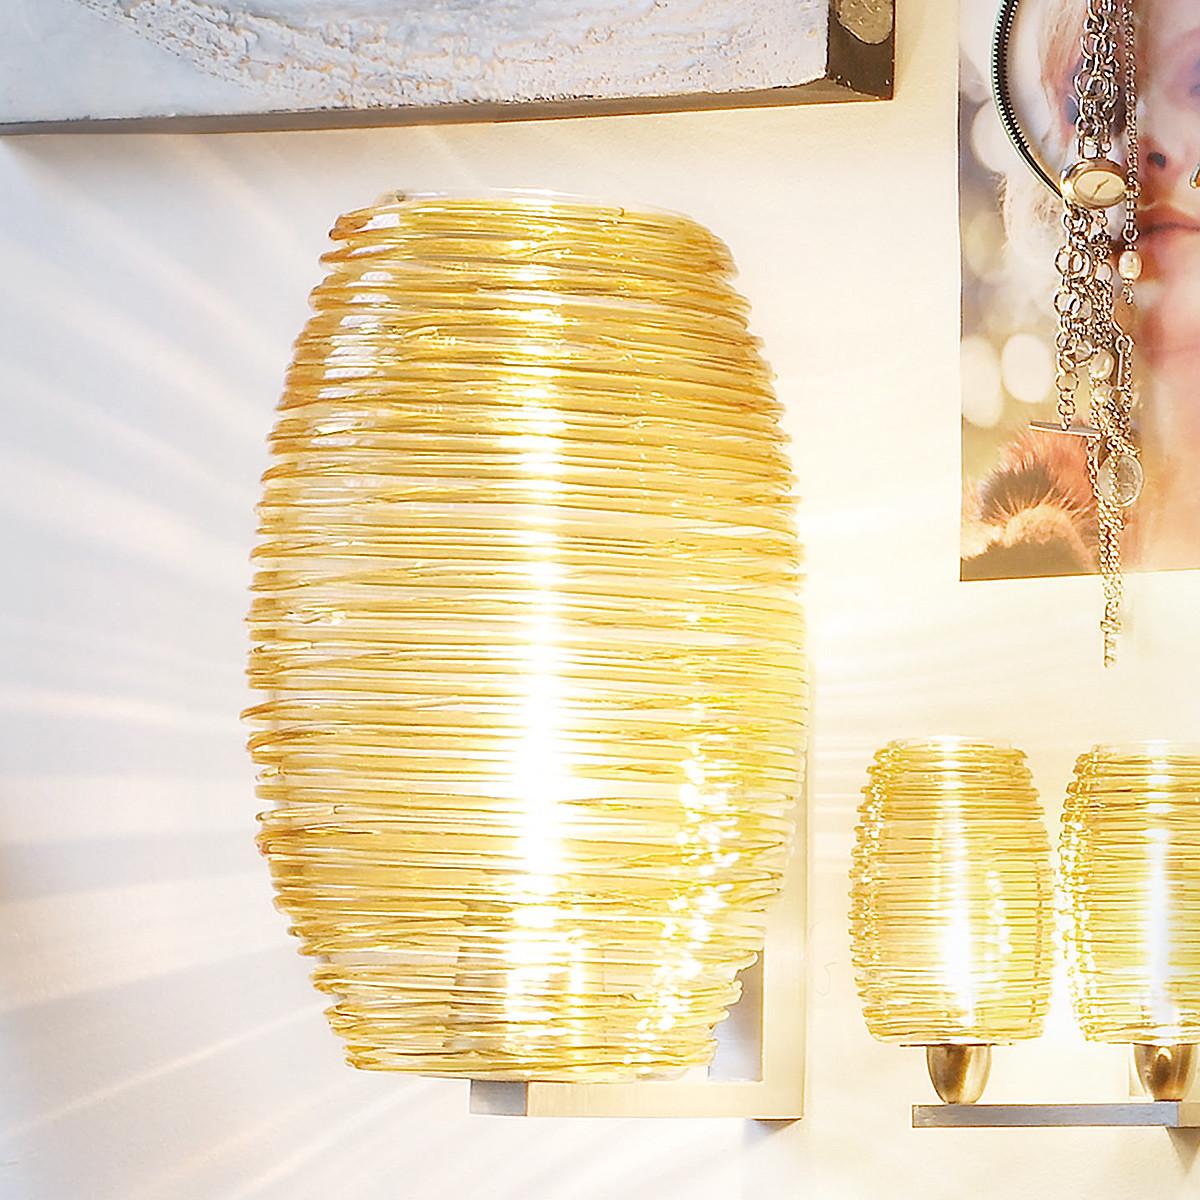 vistosi damasco ap g wandleuchte lampen shop casa de. Black Bedroom Furniture Sets. Home Design Ideas